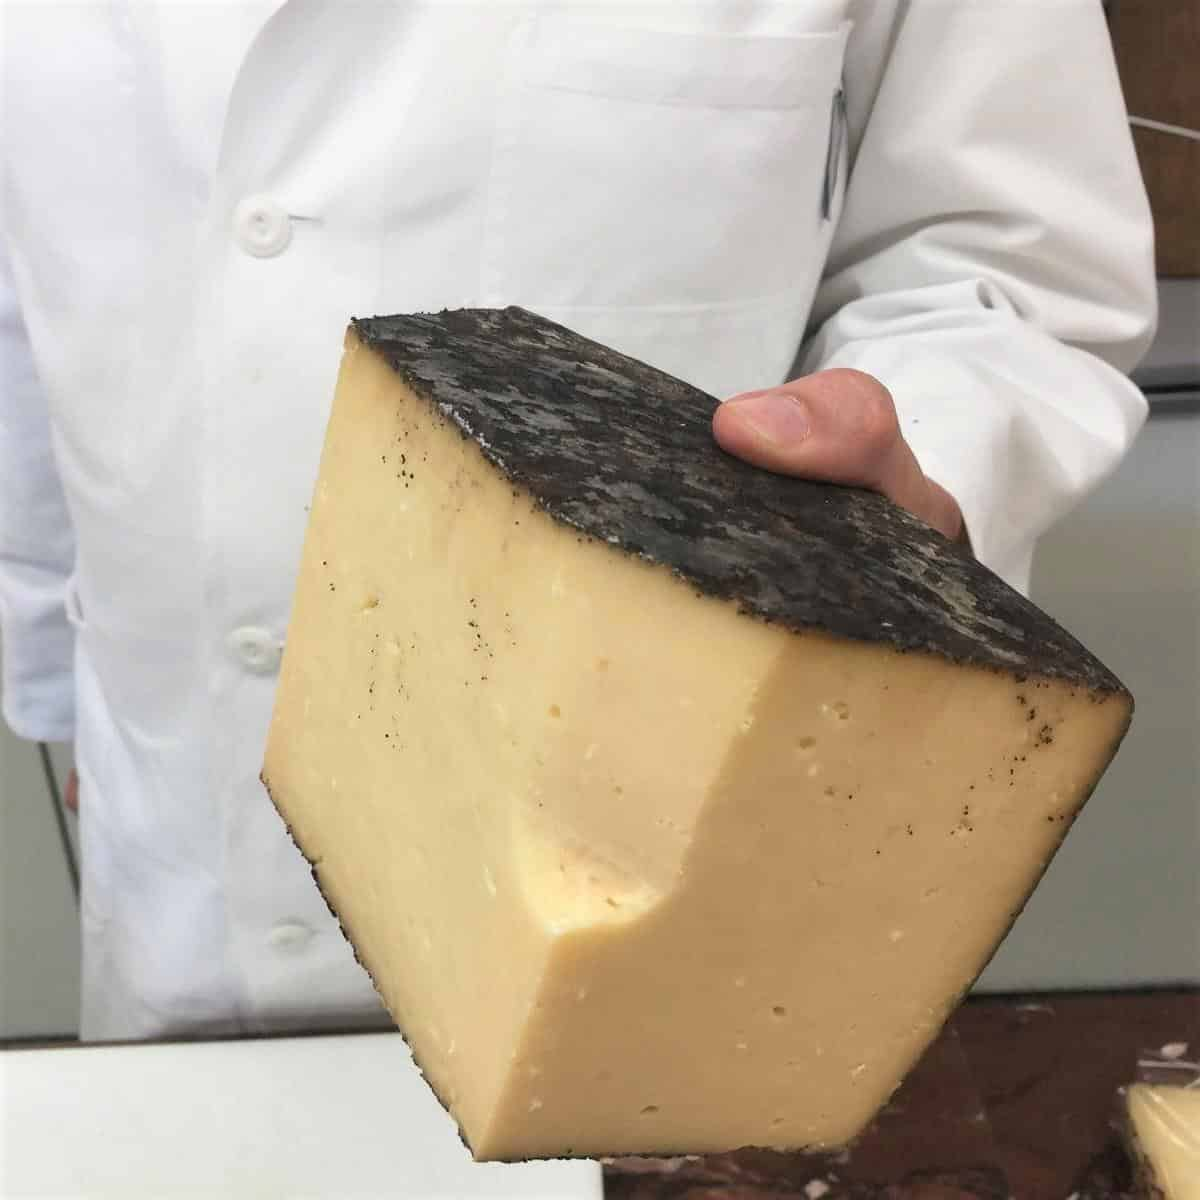 style hannover kaese schaub 5 - Käse-Schaub - Käse voller Tradition